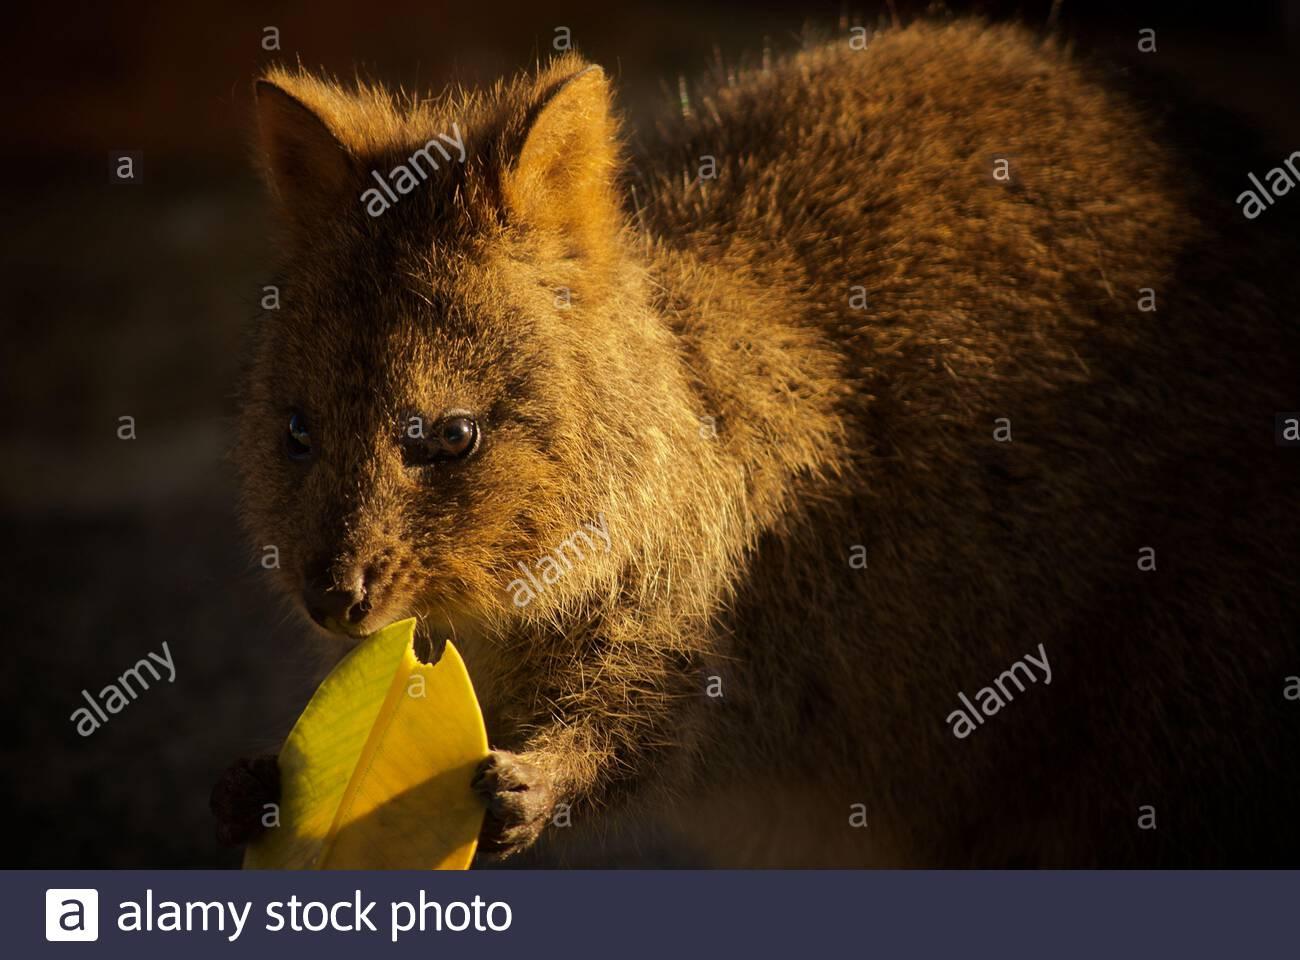 quokka-setonix-brachyurus-munching-on-a-leaf-at-rottnest-island-western-australia-2AP4WGG.jpg